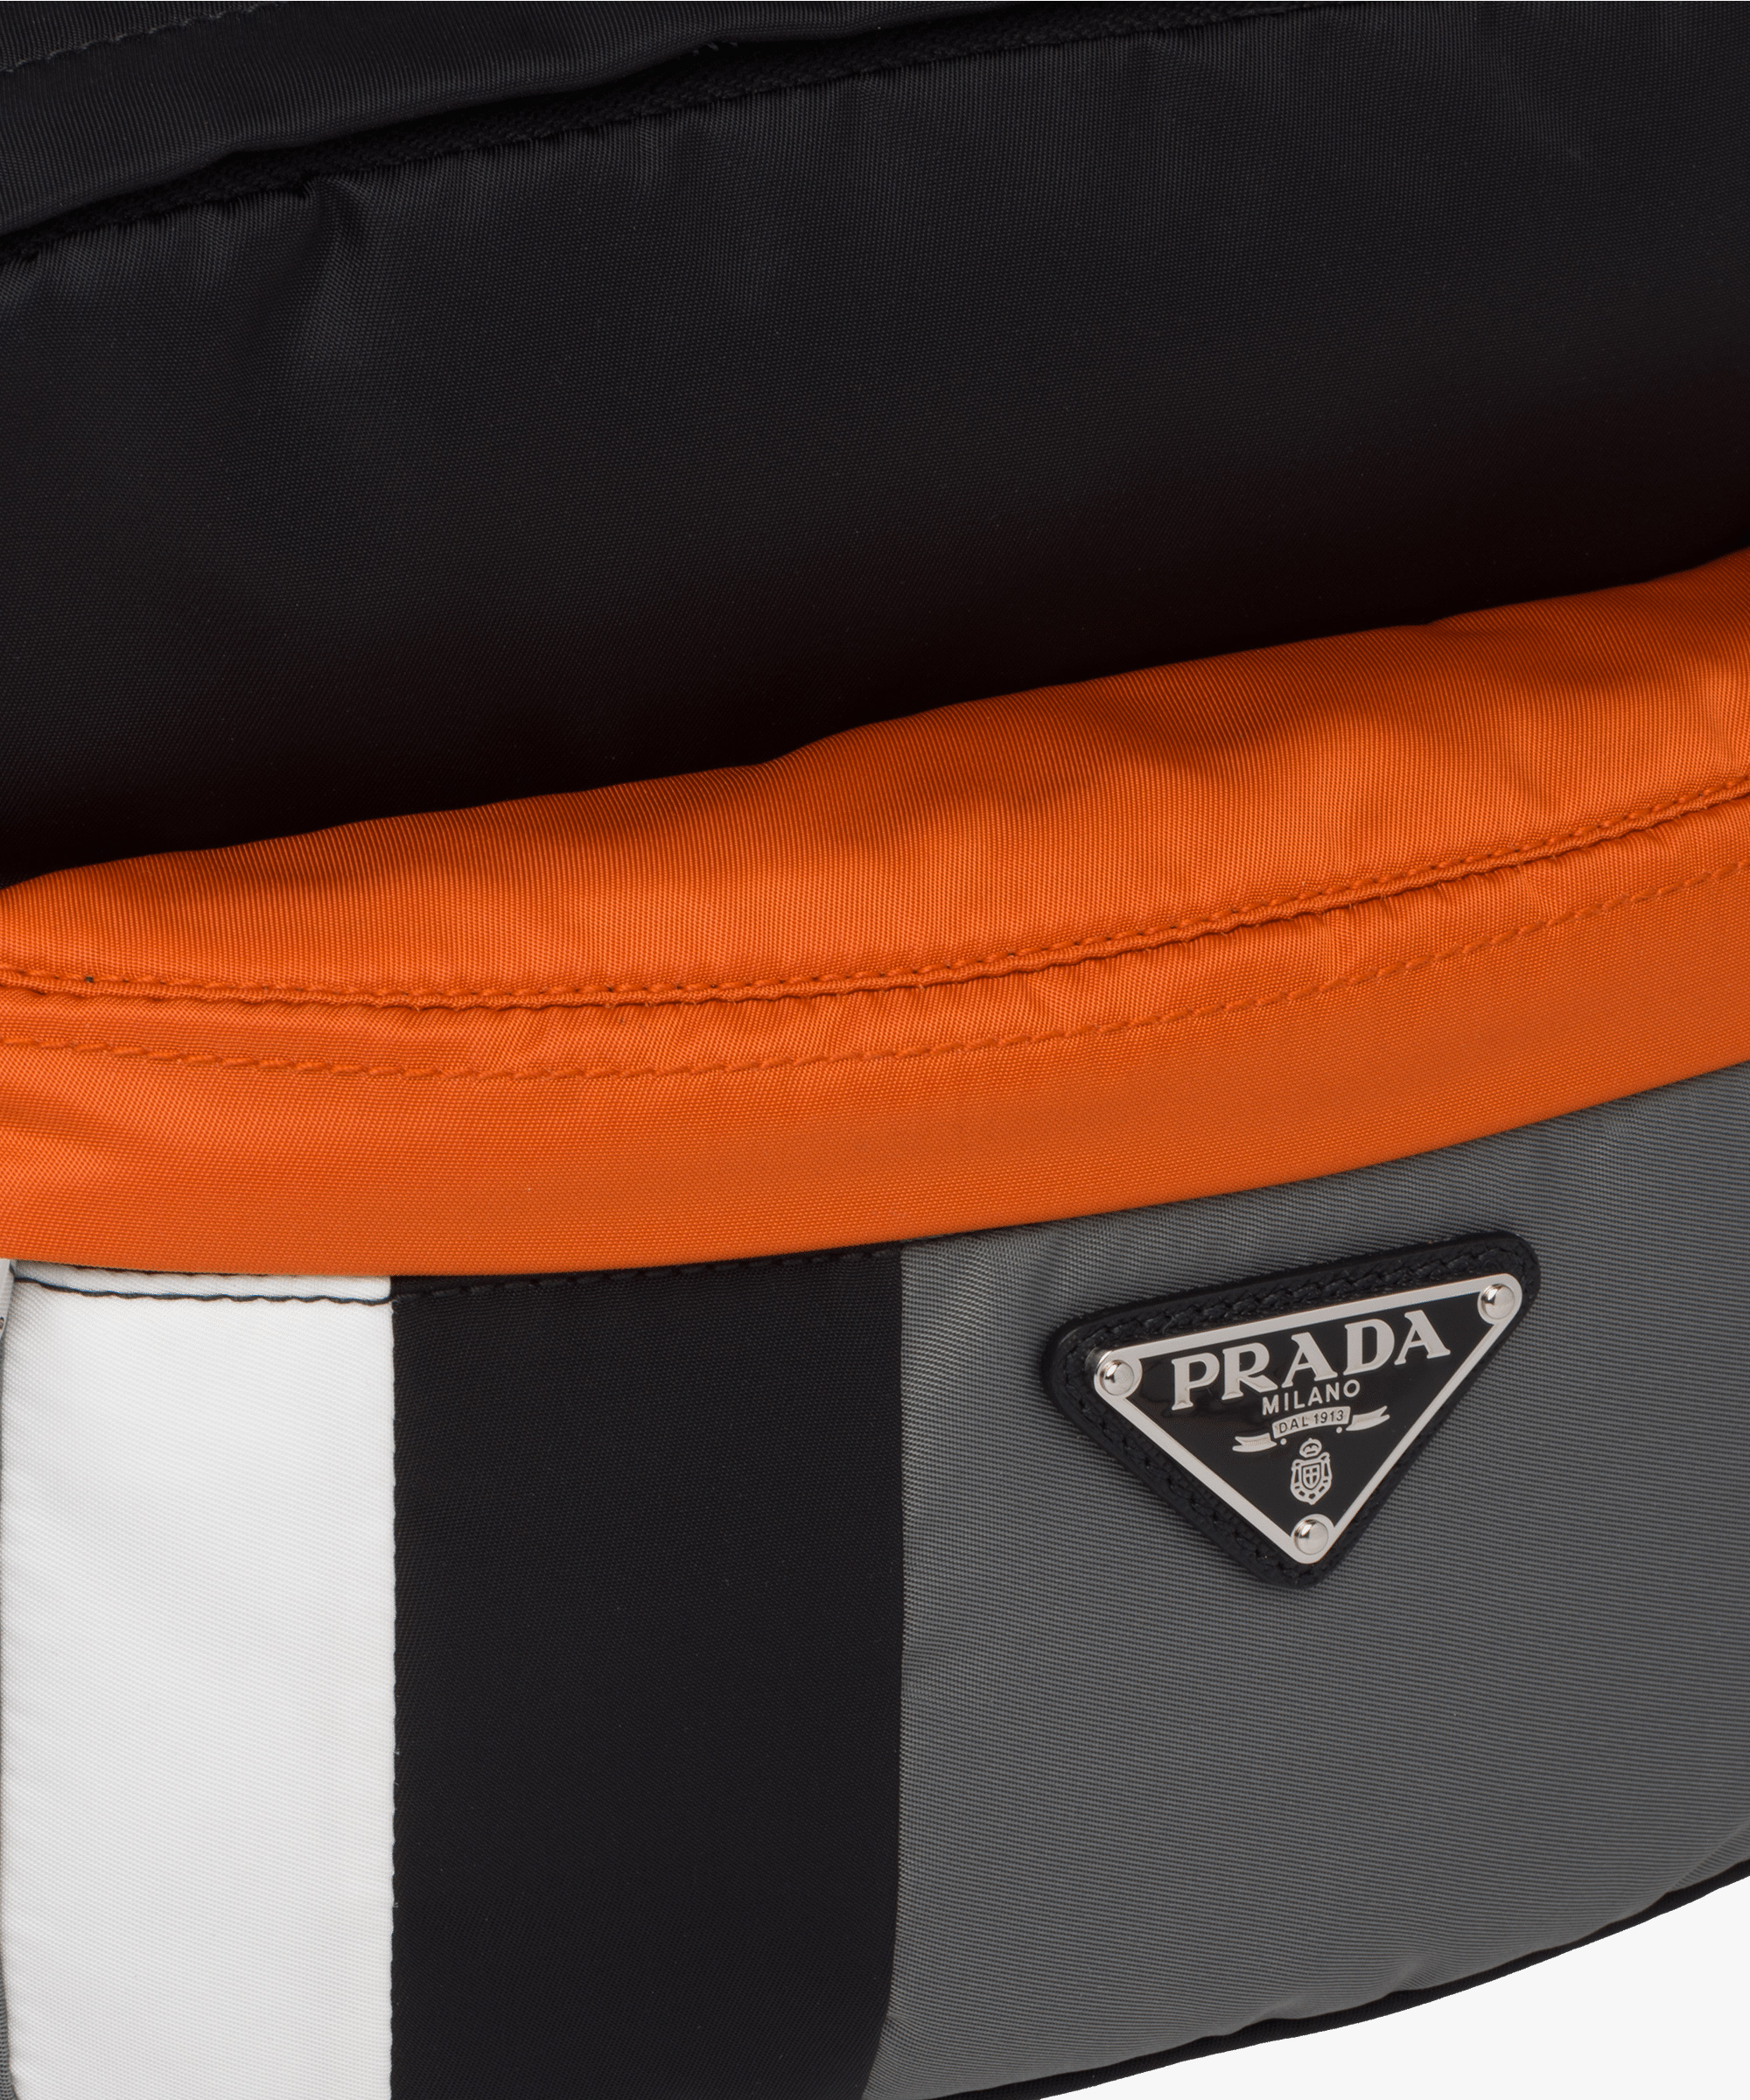 3cce40f76a89 ... Printed technical fabric bandoleer bag Prada BLACK SLATE GRAY ...